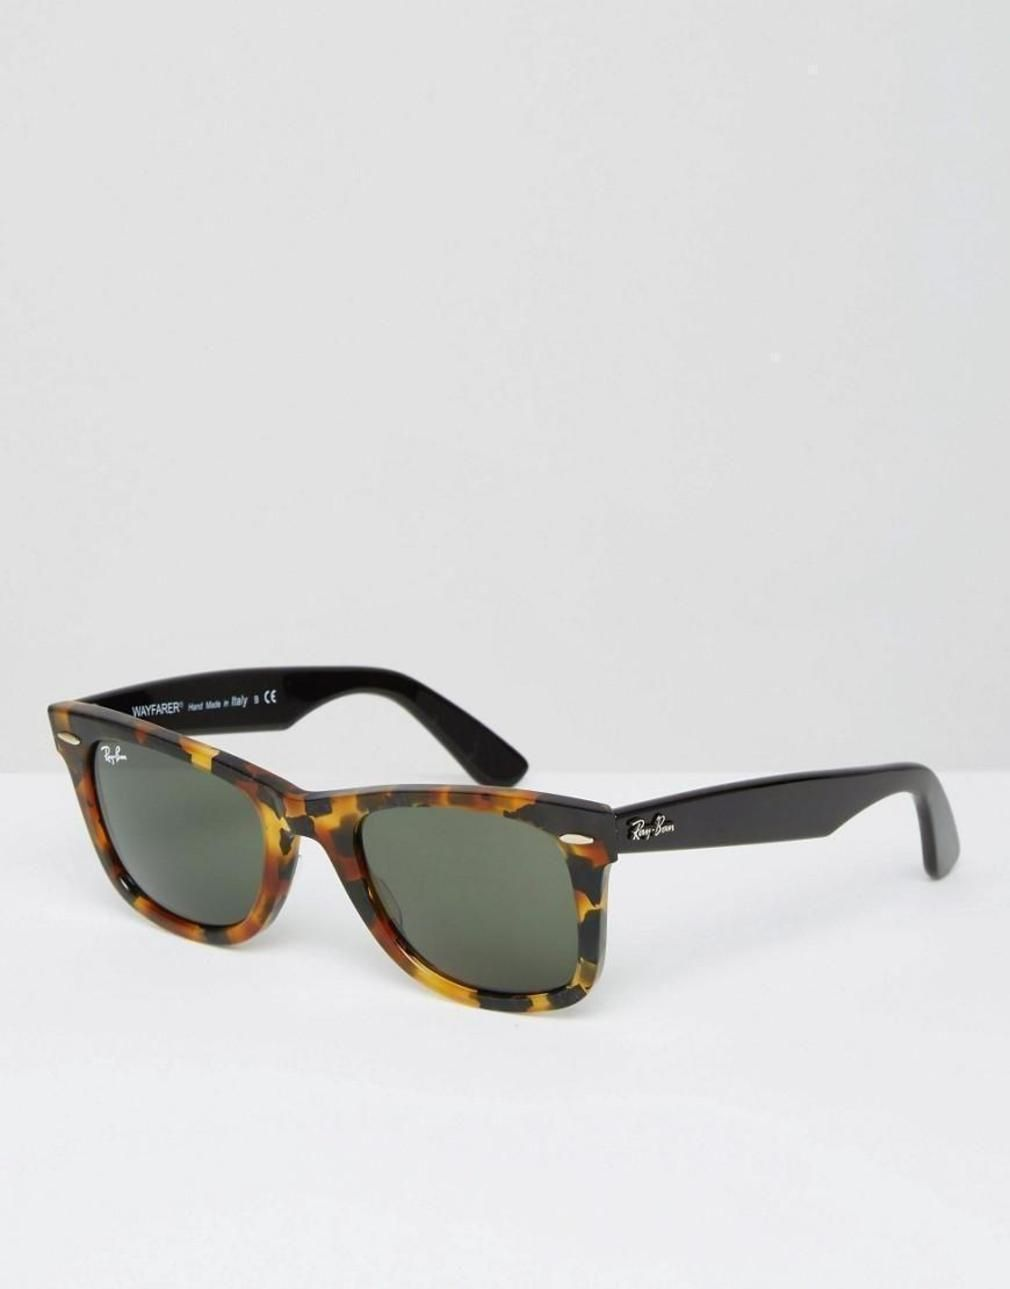 ae630fade23a0 Ray-Ban Wayfarer Sunglasses 0RB2140